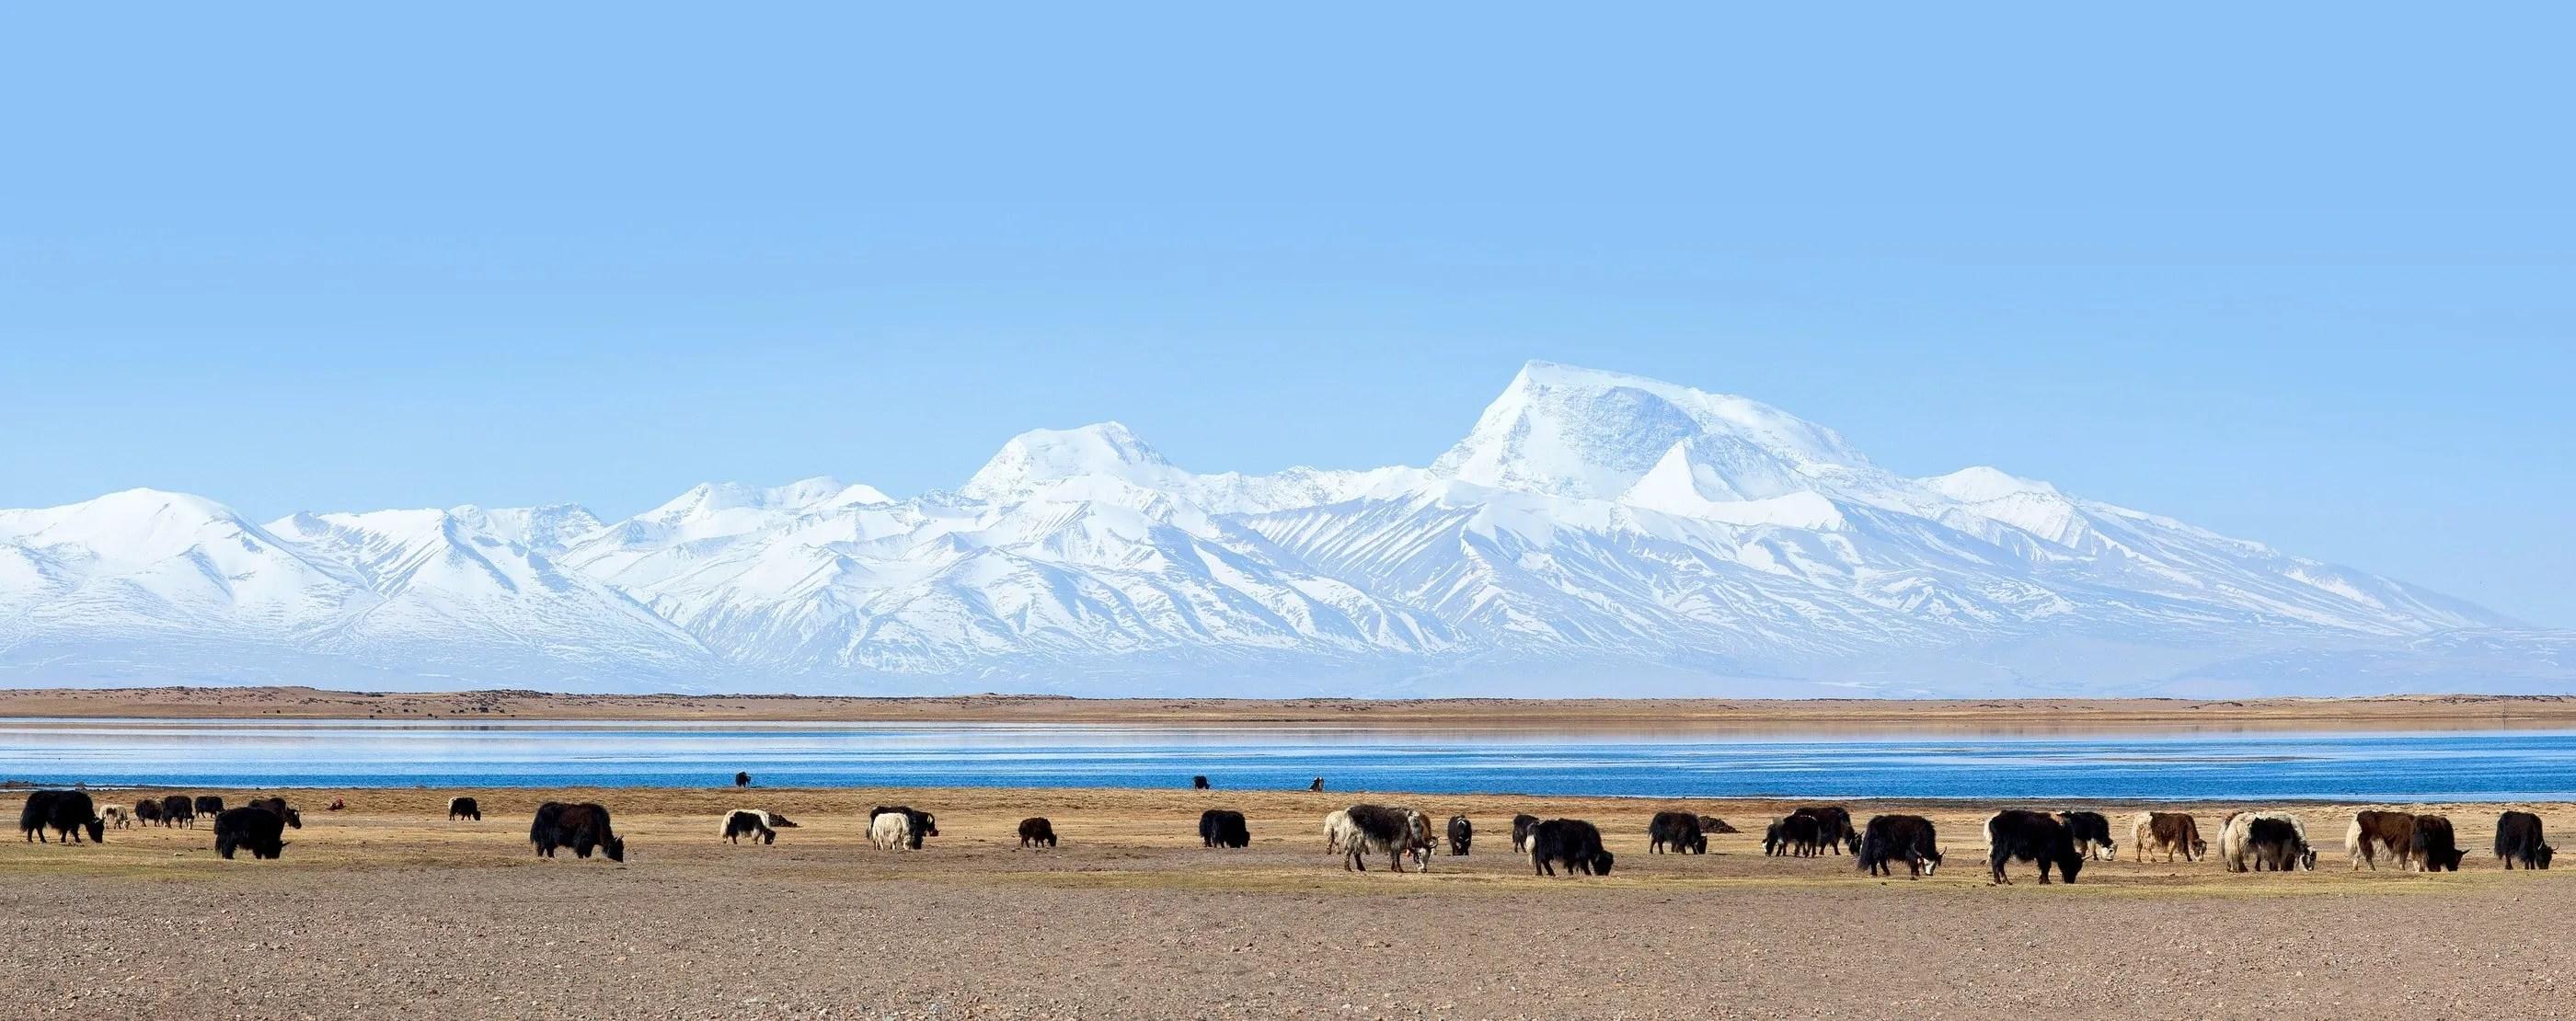 Herd of Yaks by the lake Manasarovar